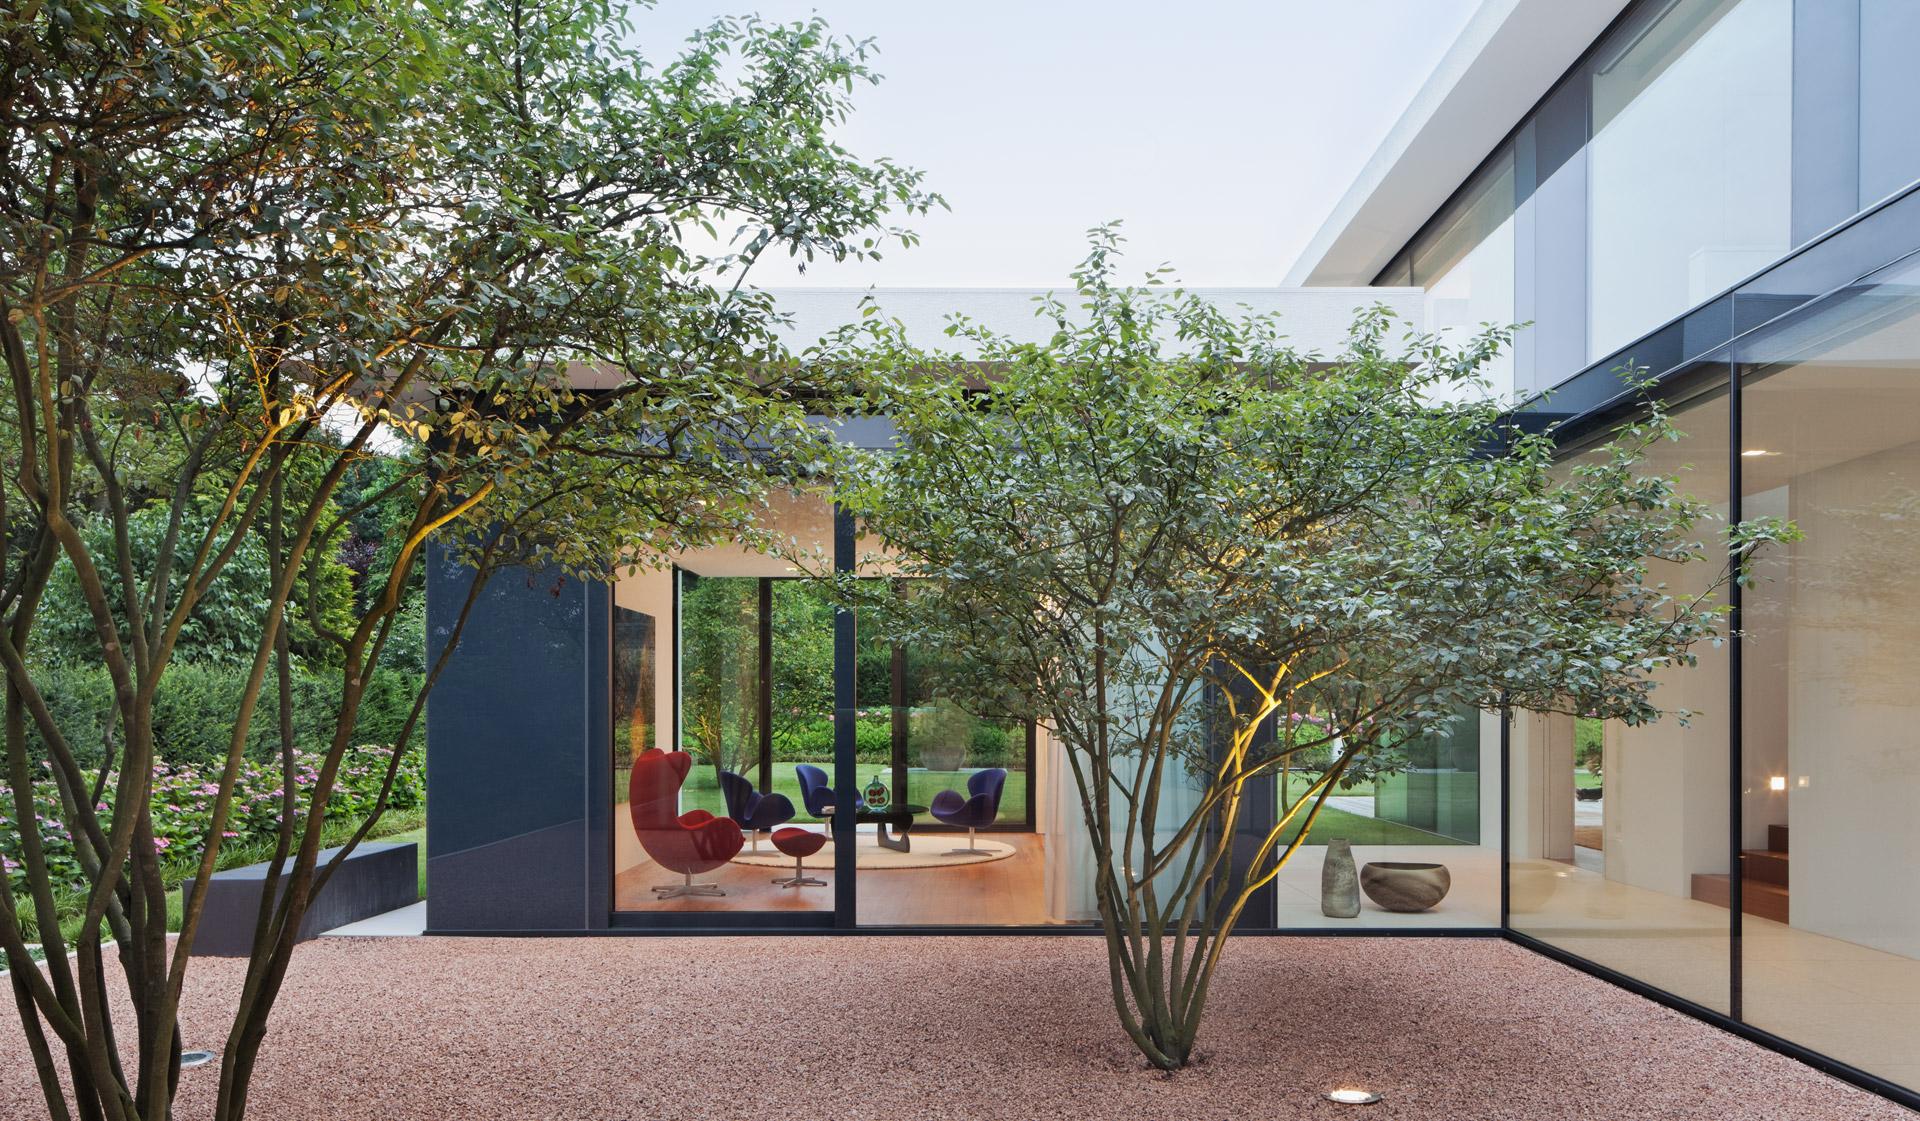 PavillonVilla in Bayern Weber Hummel Architekten 5